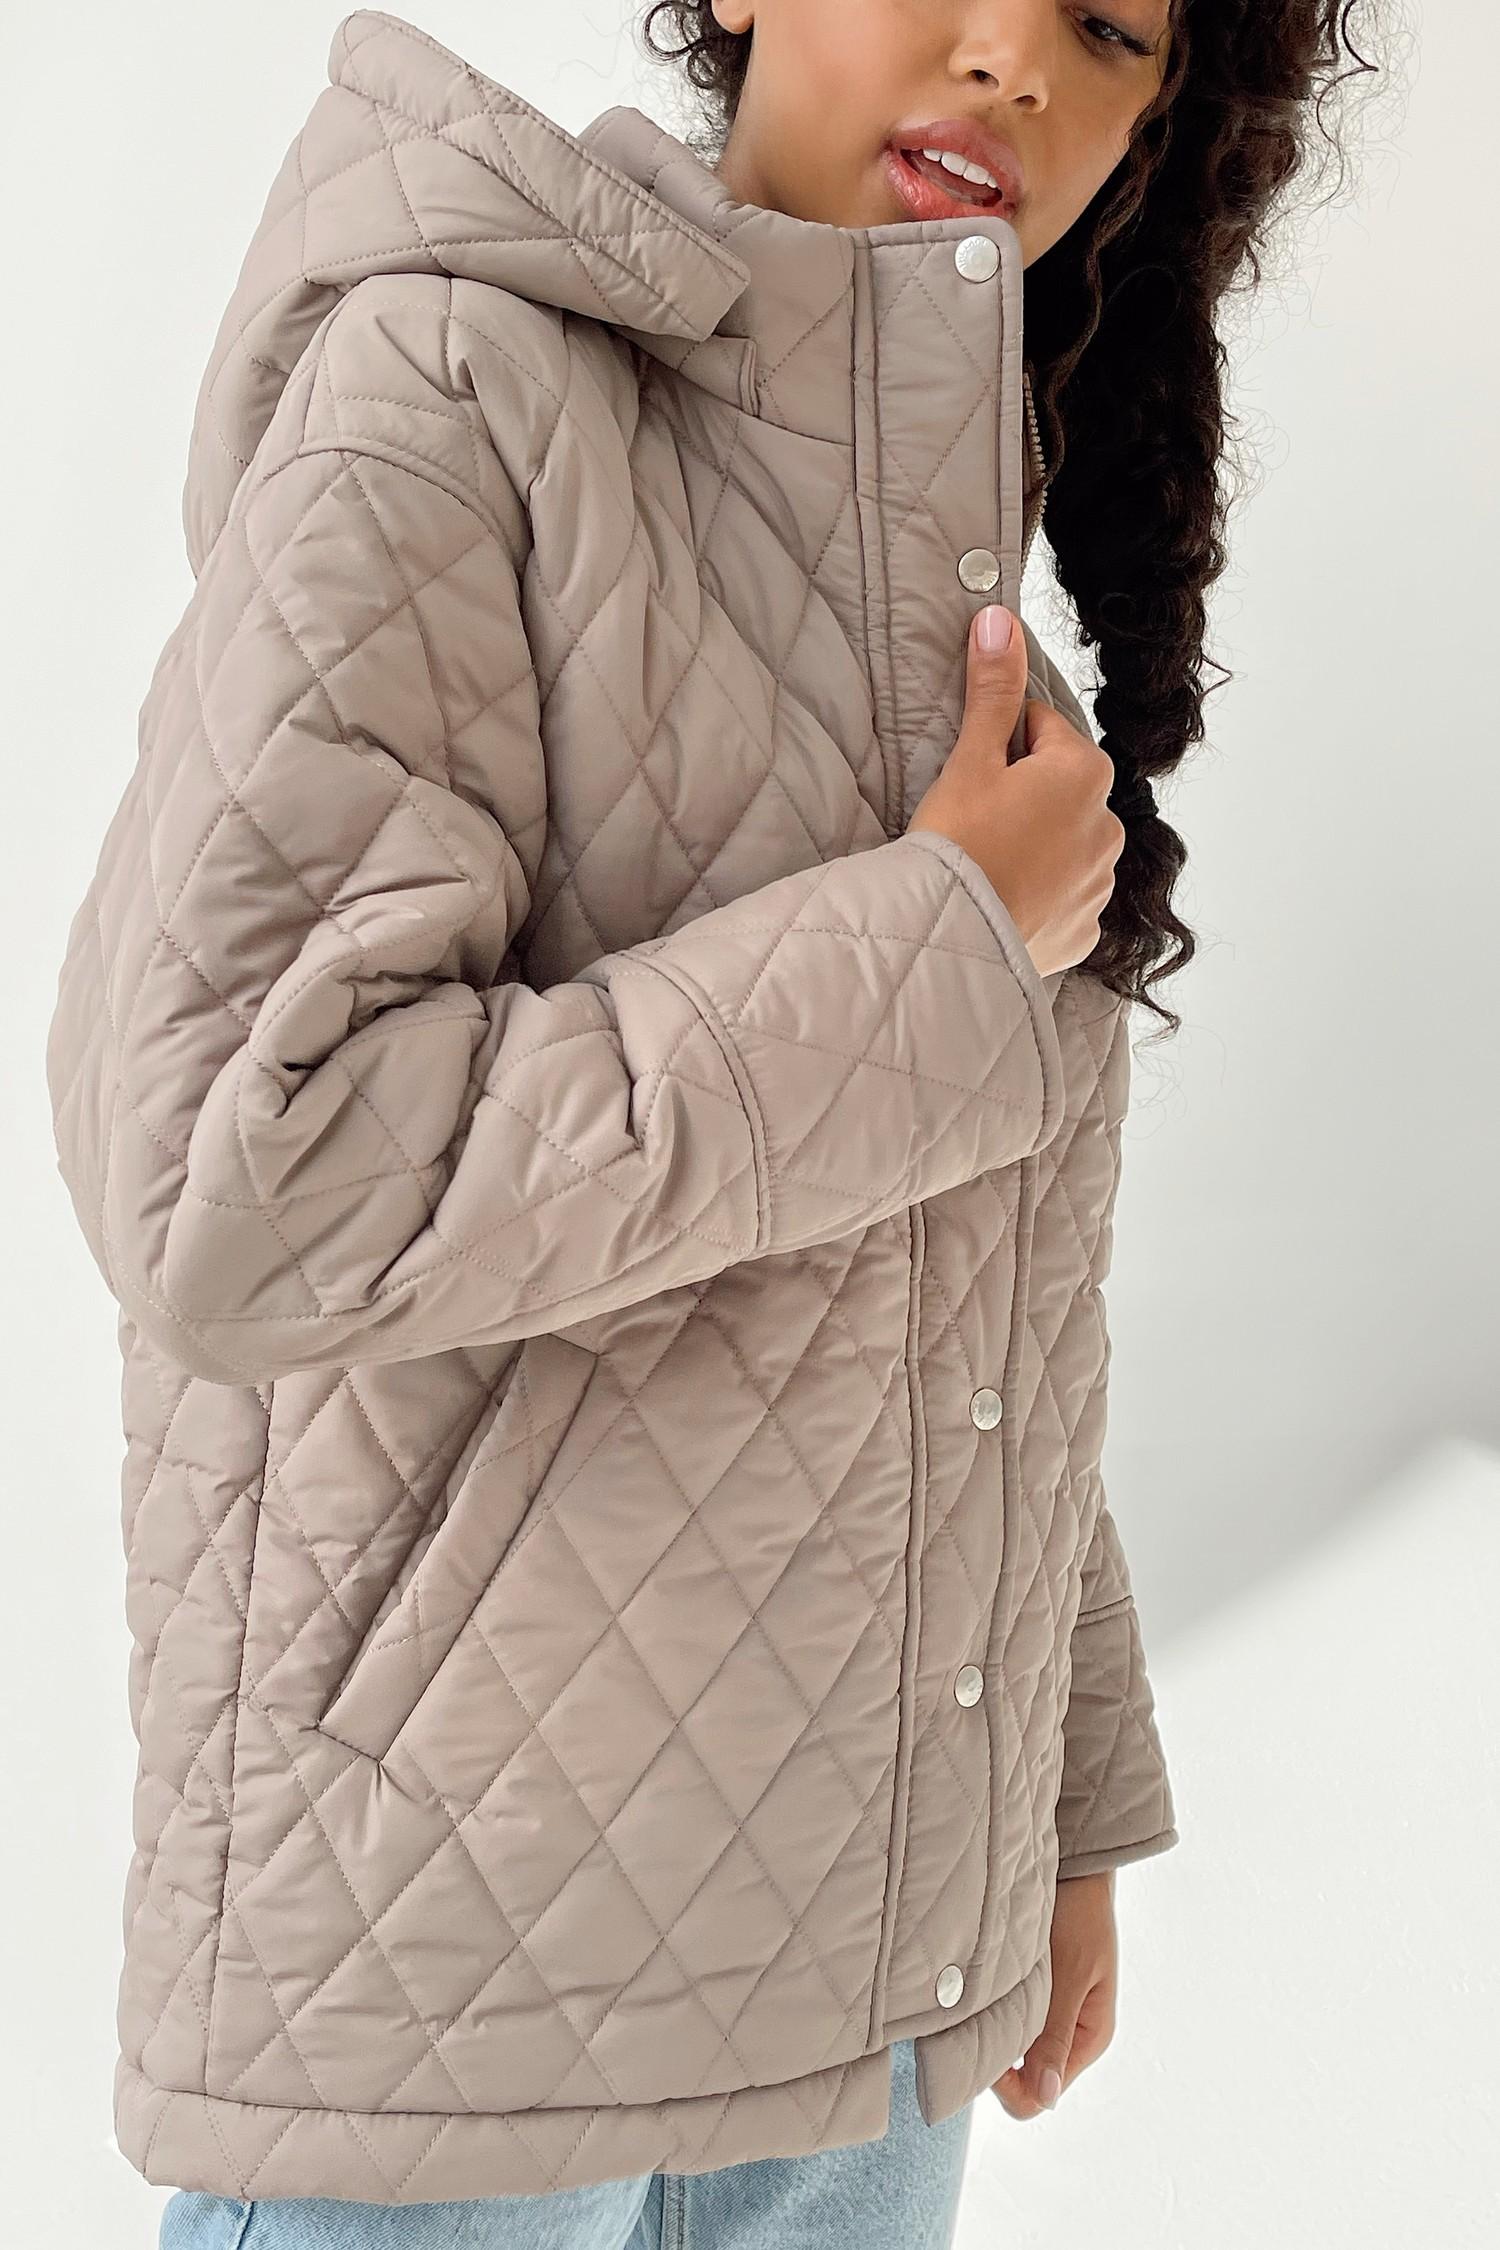 Куртка стеганая в ромб капучино - THE LACE